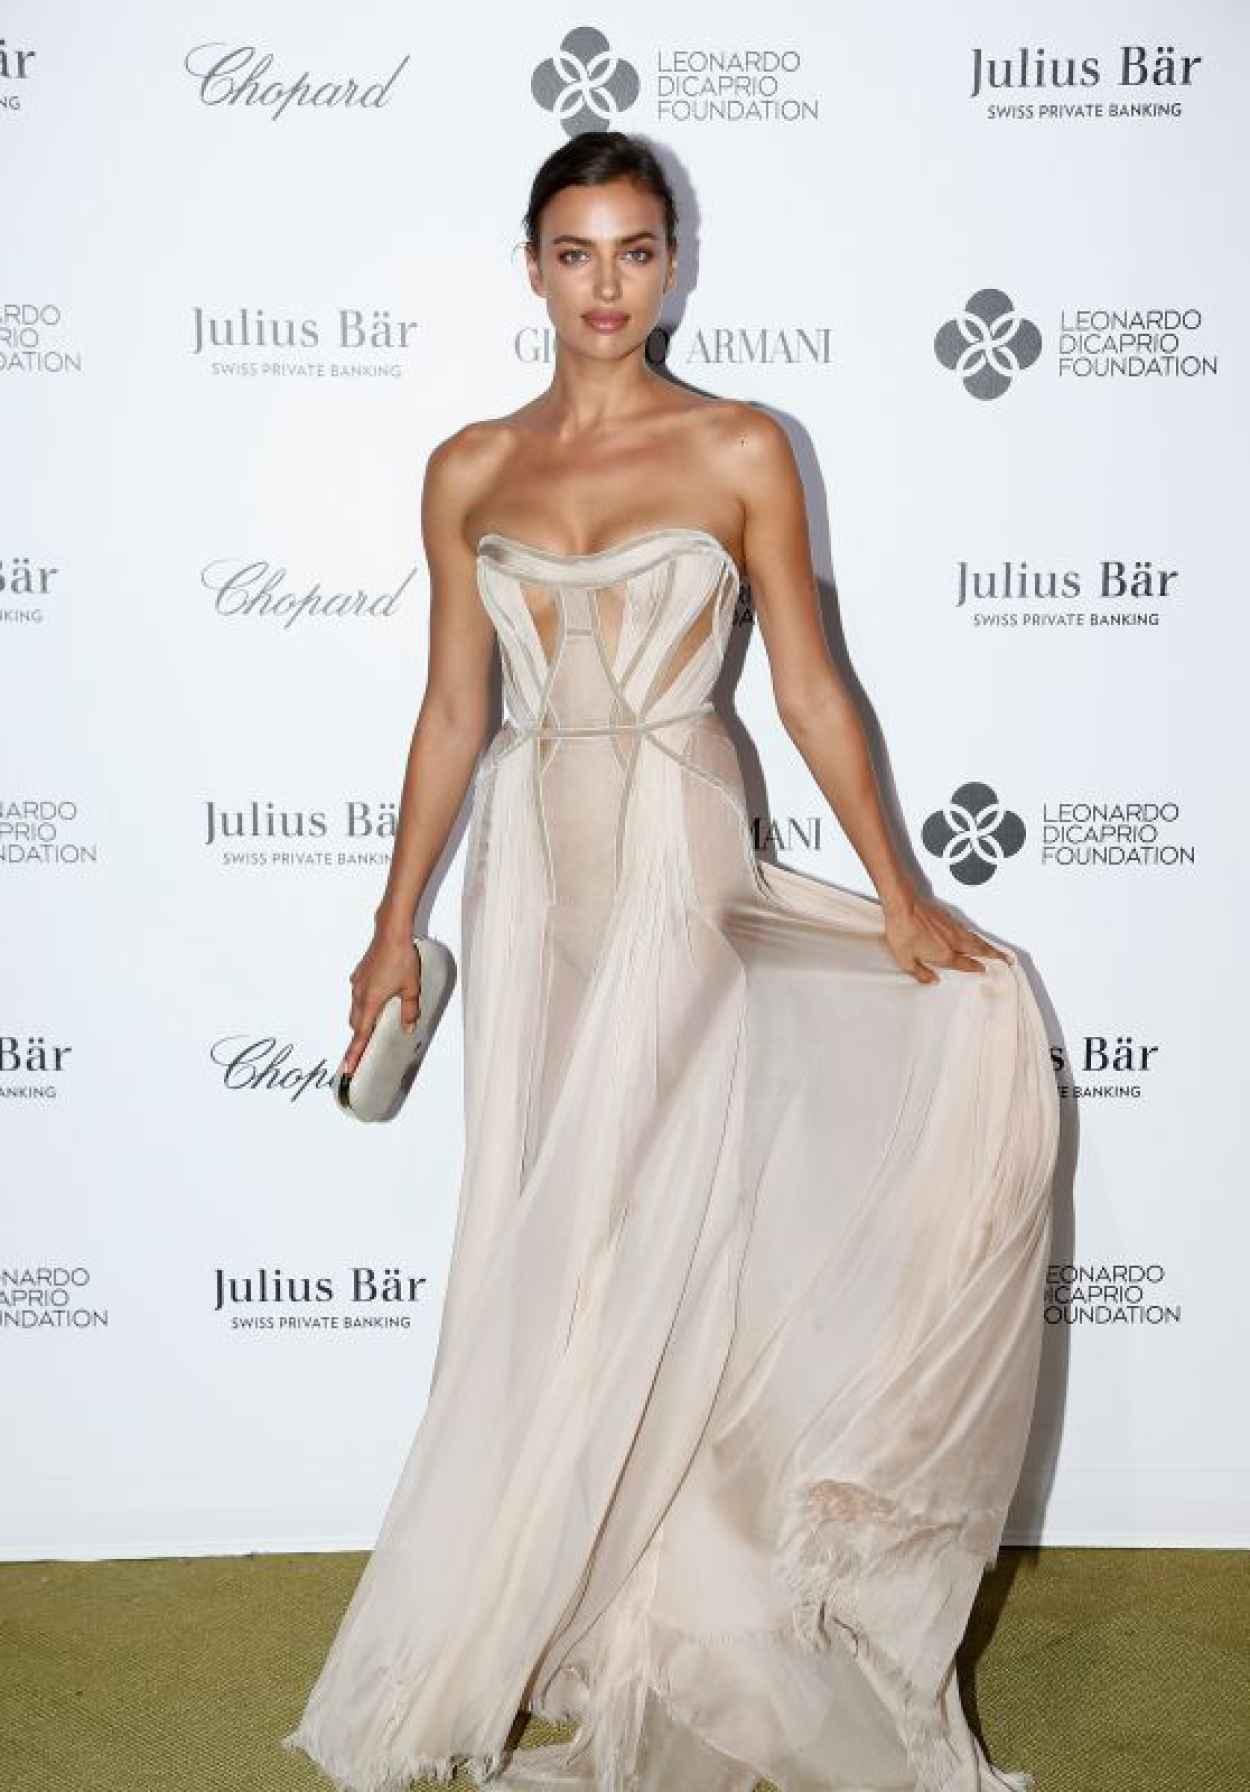 Irina Shayk - 2015 Leonardo DiCaprio Foundation Saint-Tropez Gala-1